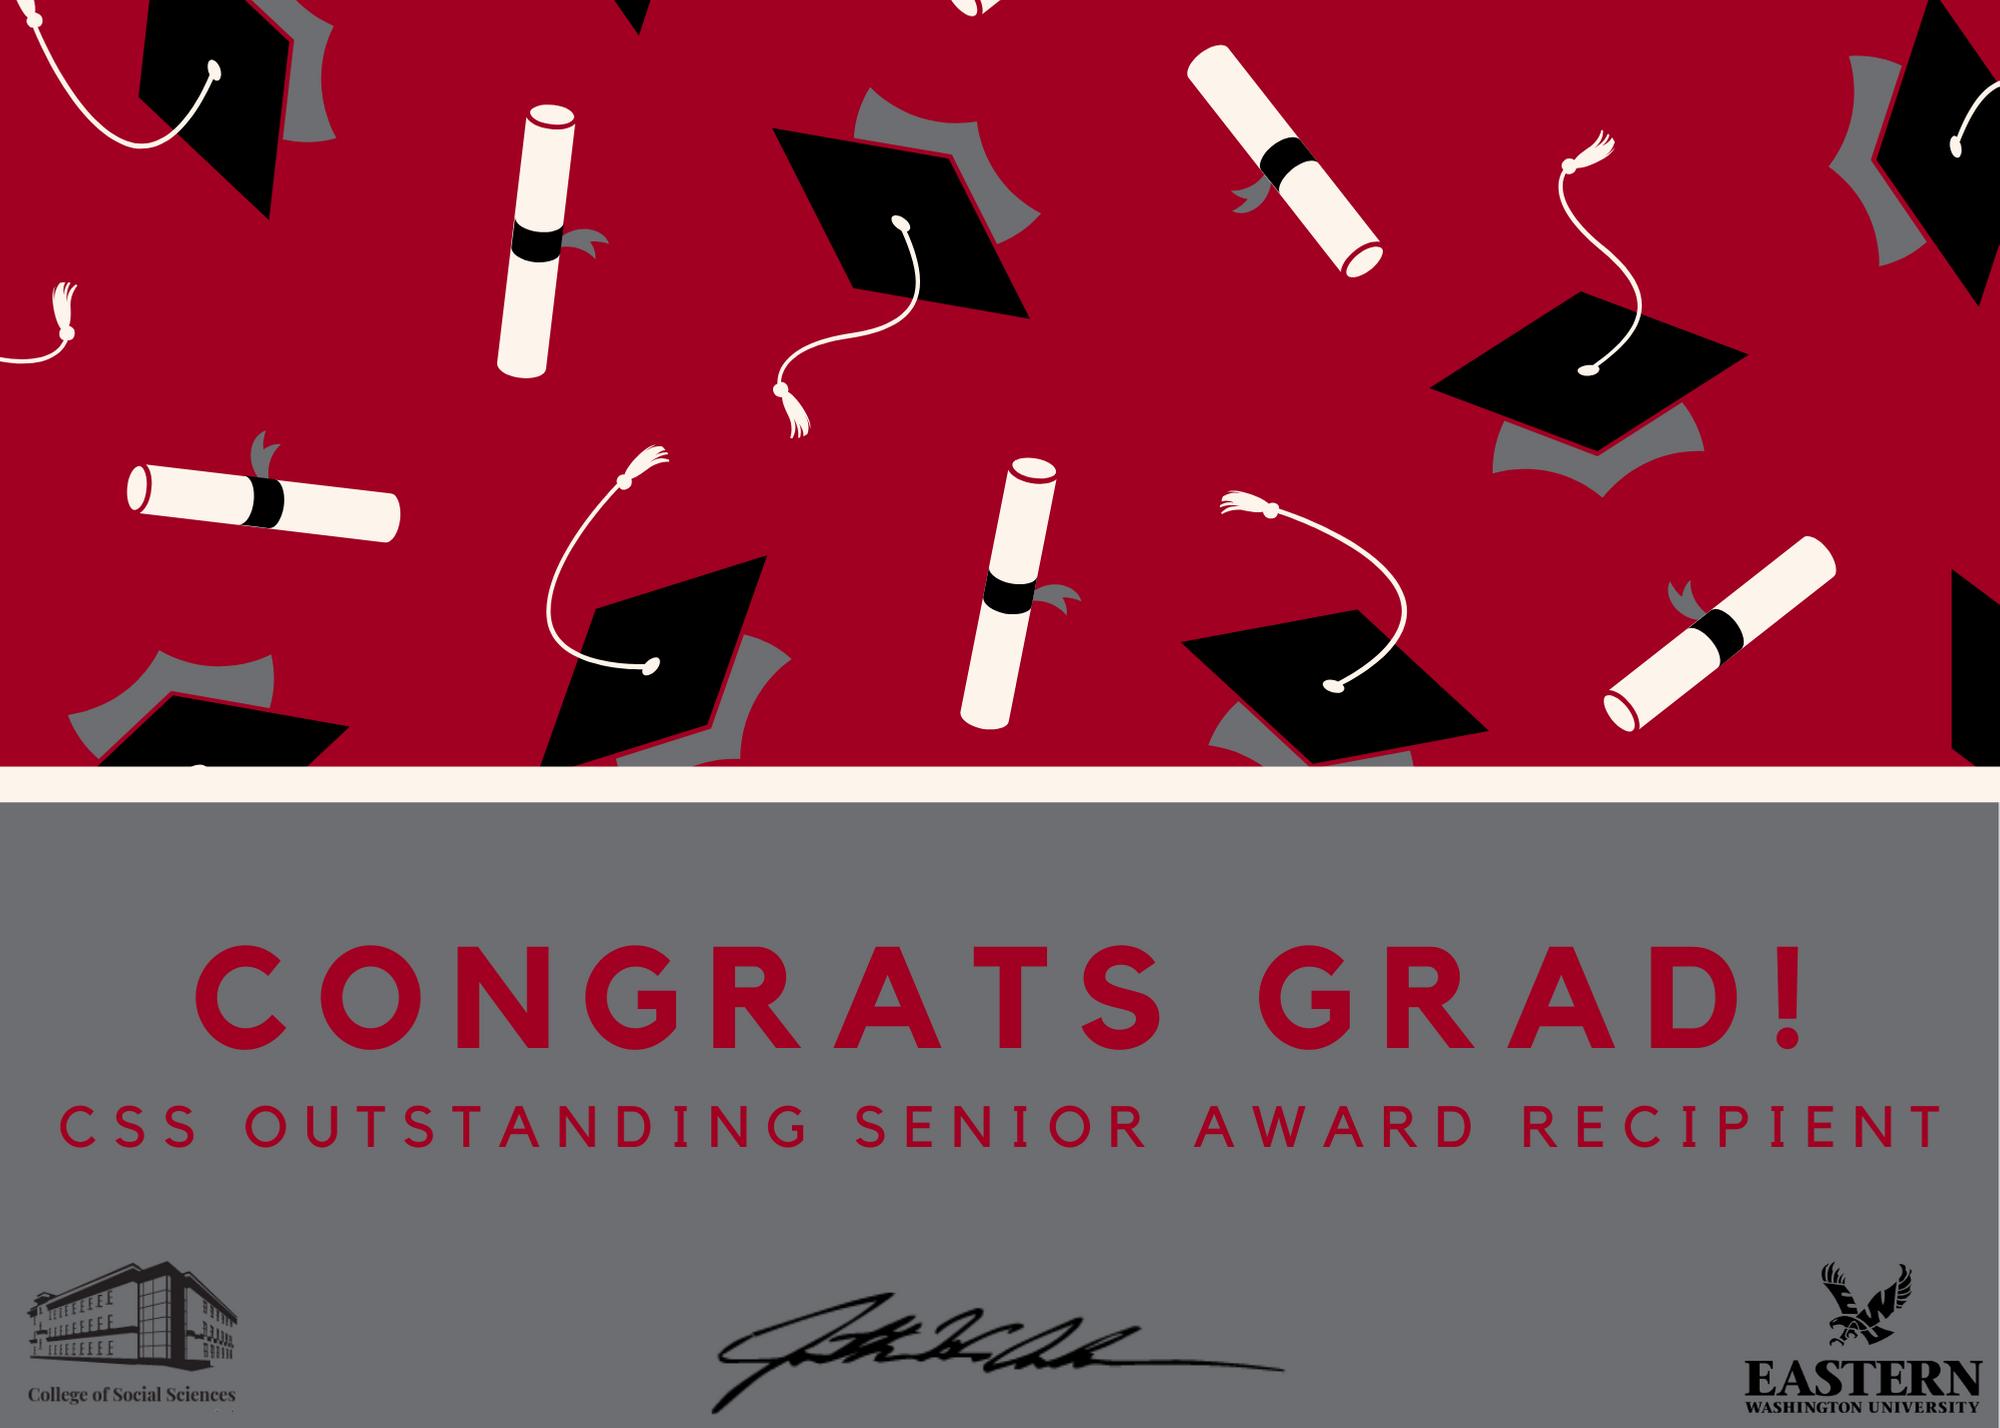 2083-caps-and-diplomas-pattern-graduation-card-2.png